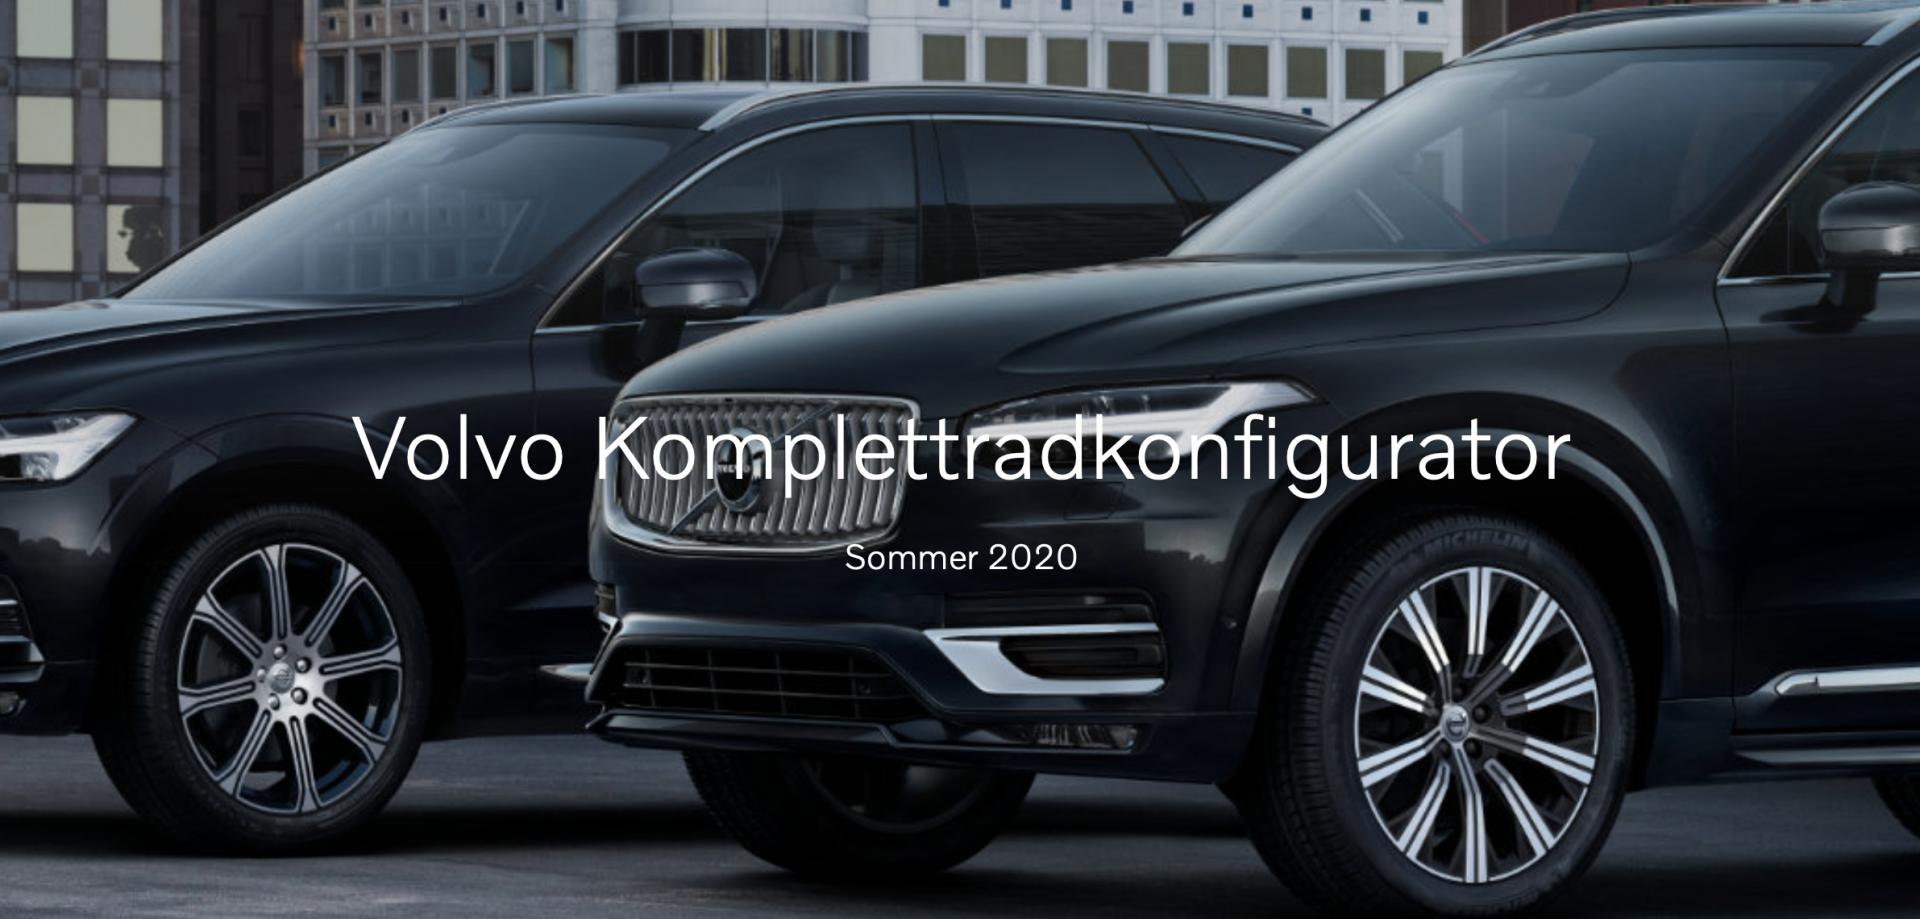 Volvo_Komplettradkonfigurator_1